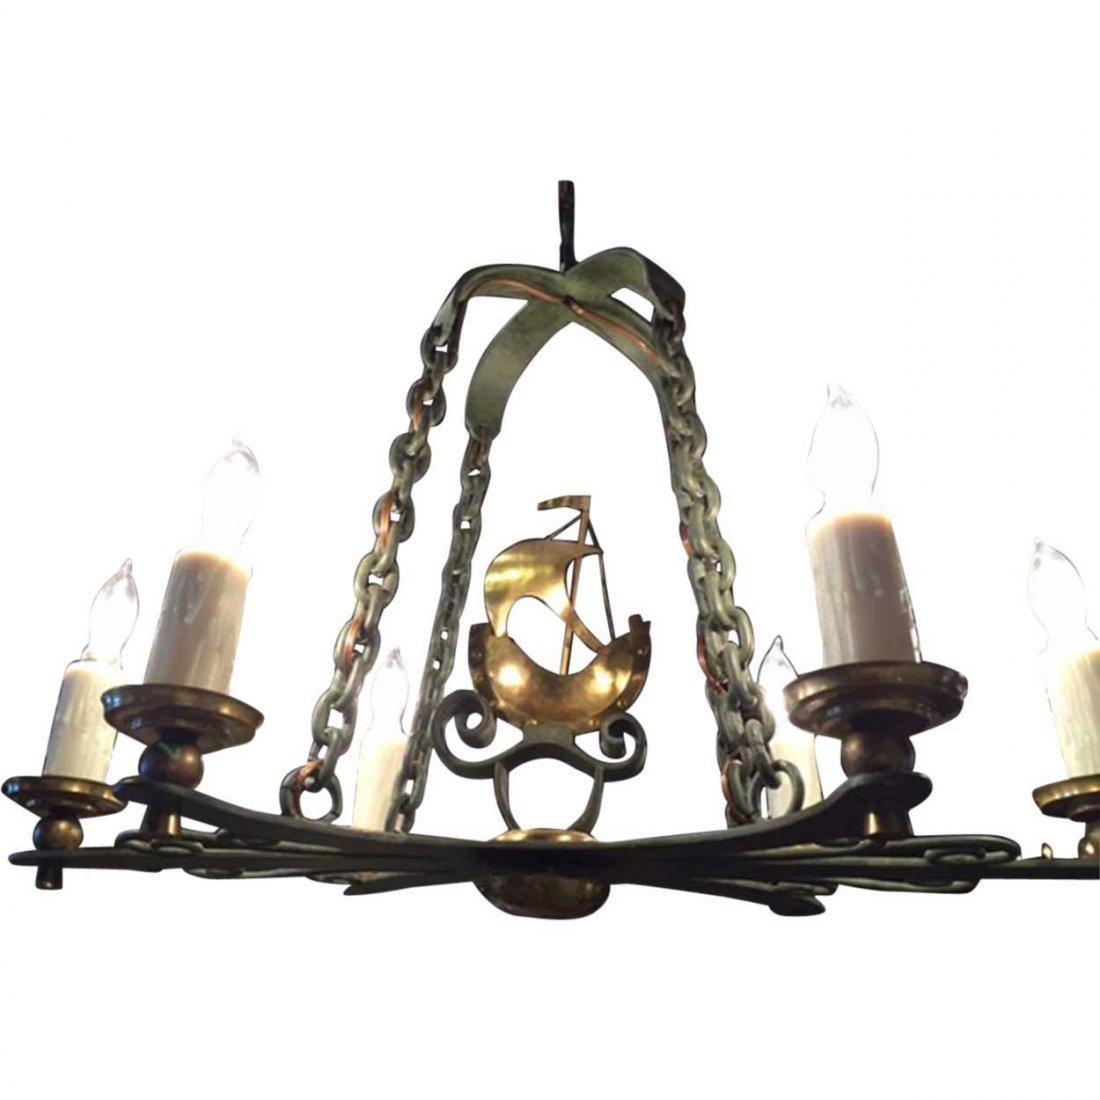 Vintage Swedish Brass and Bronze Ship Chandelier